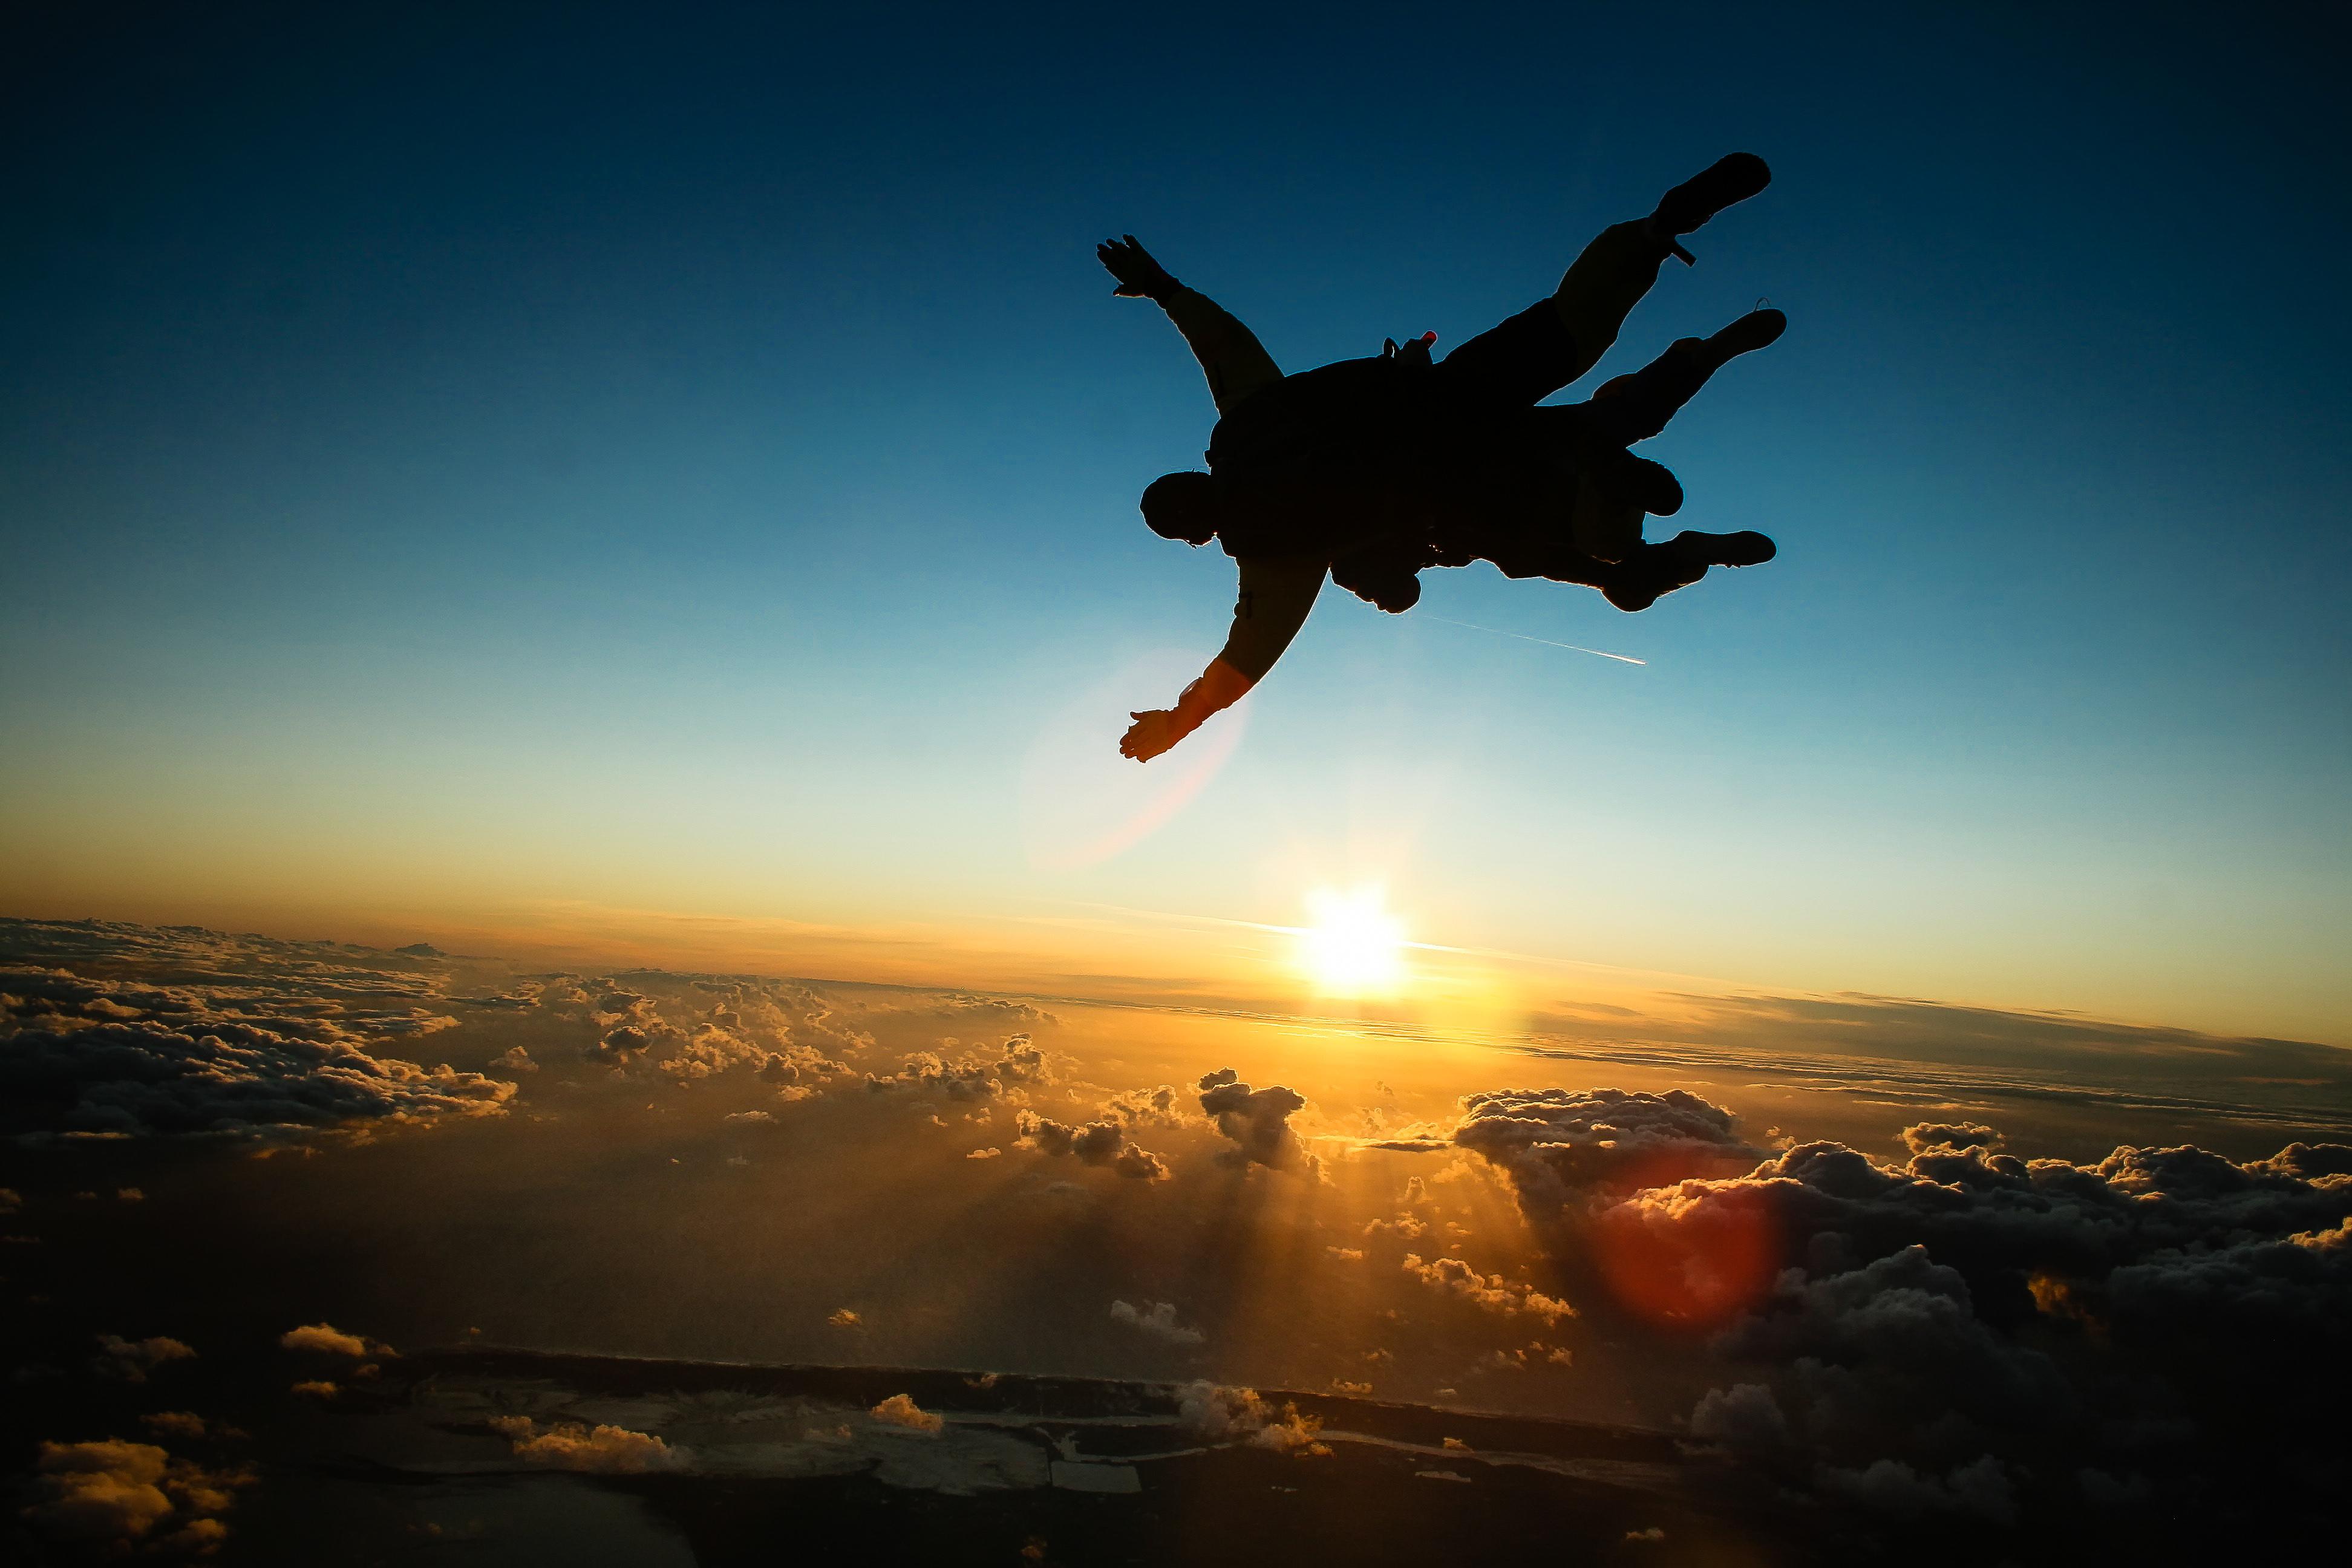 skydiving wallpaper sunset free - photo #4